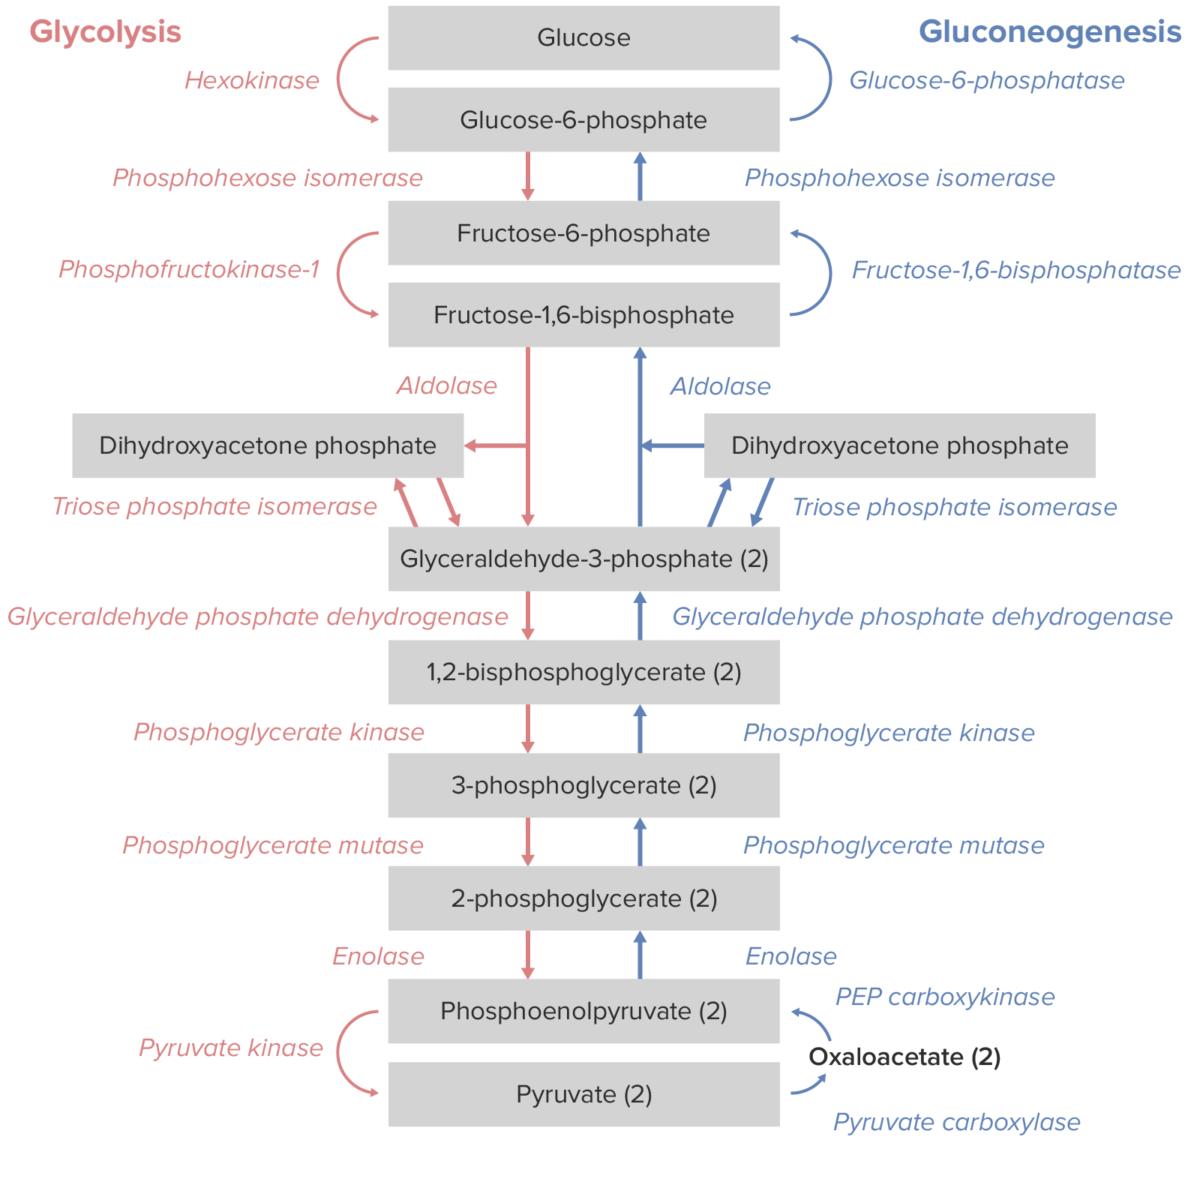 Gluconeogenesis Glycolysis